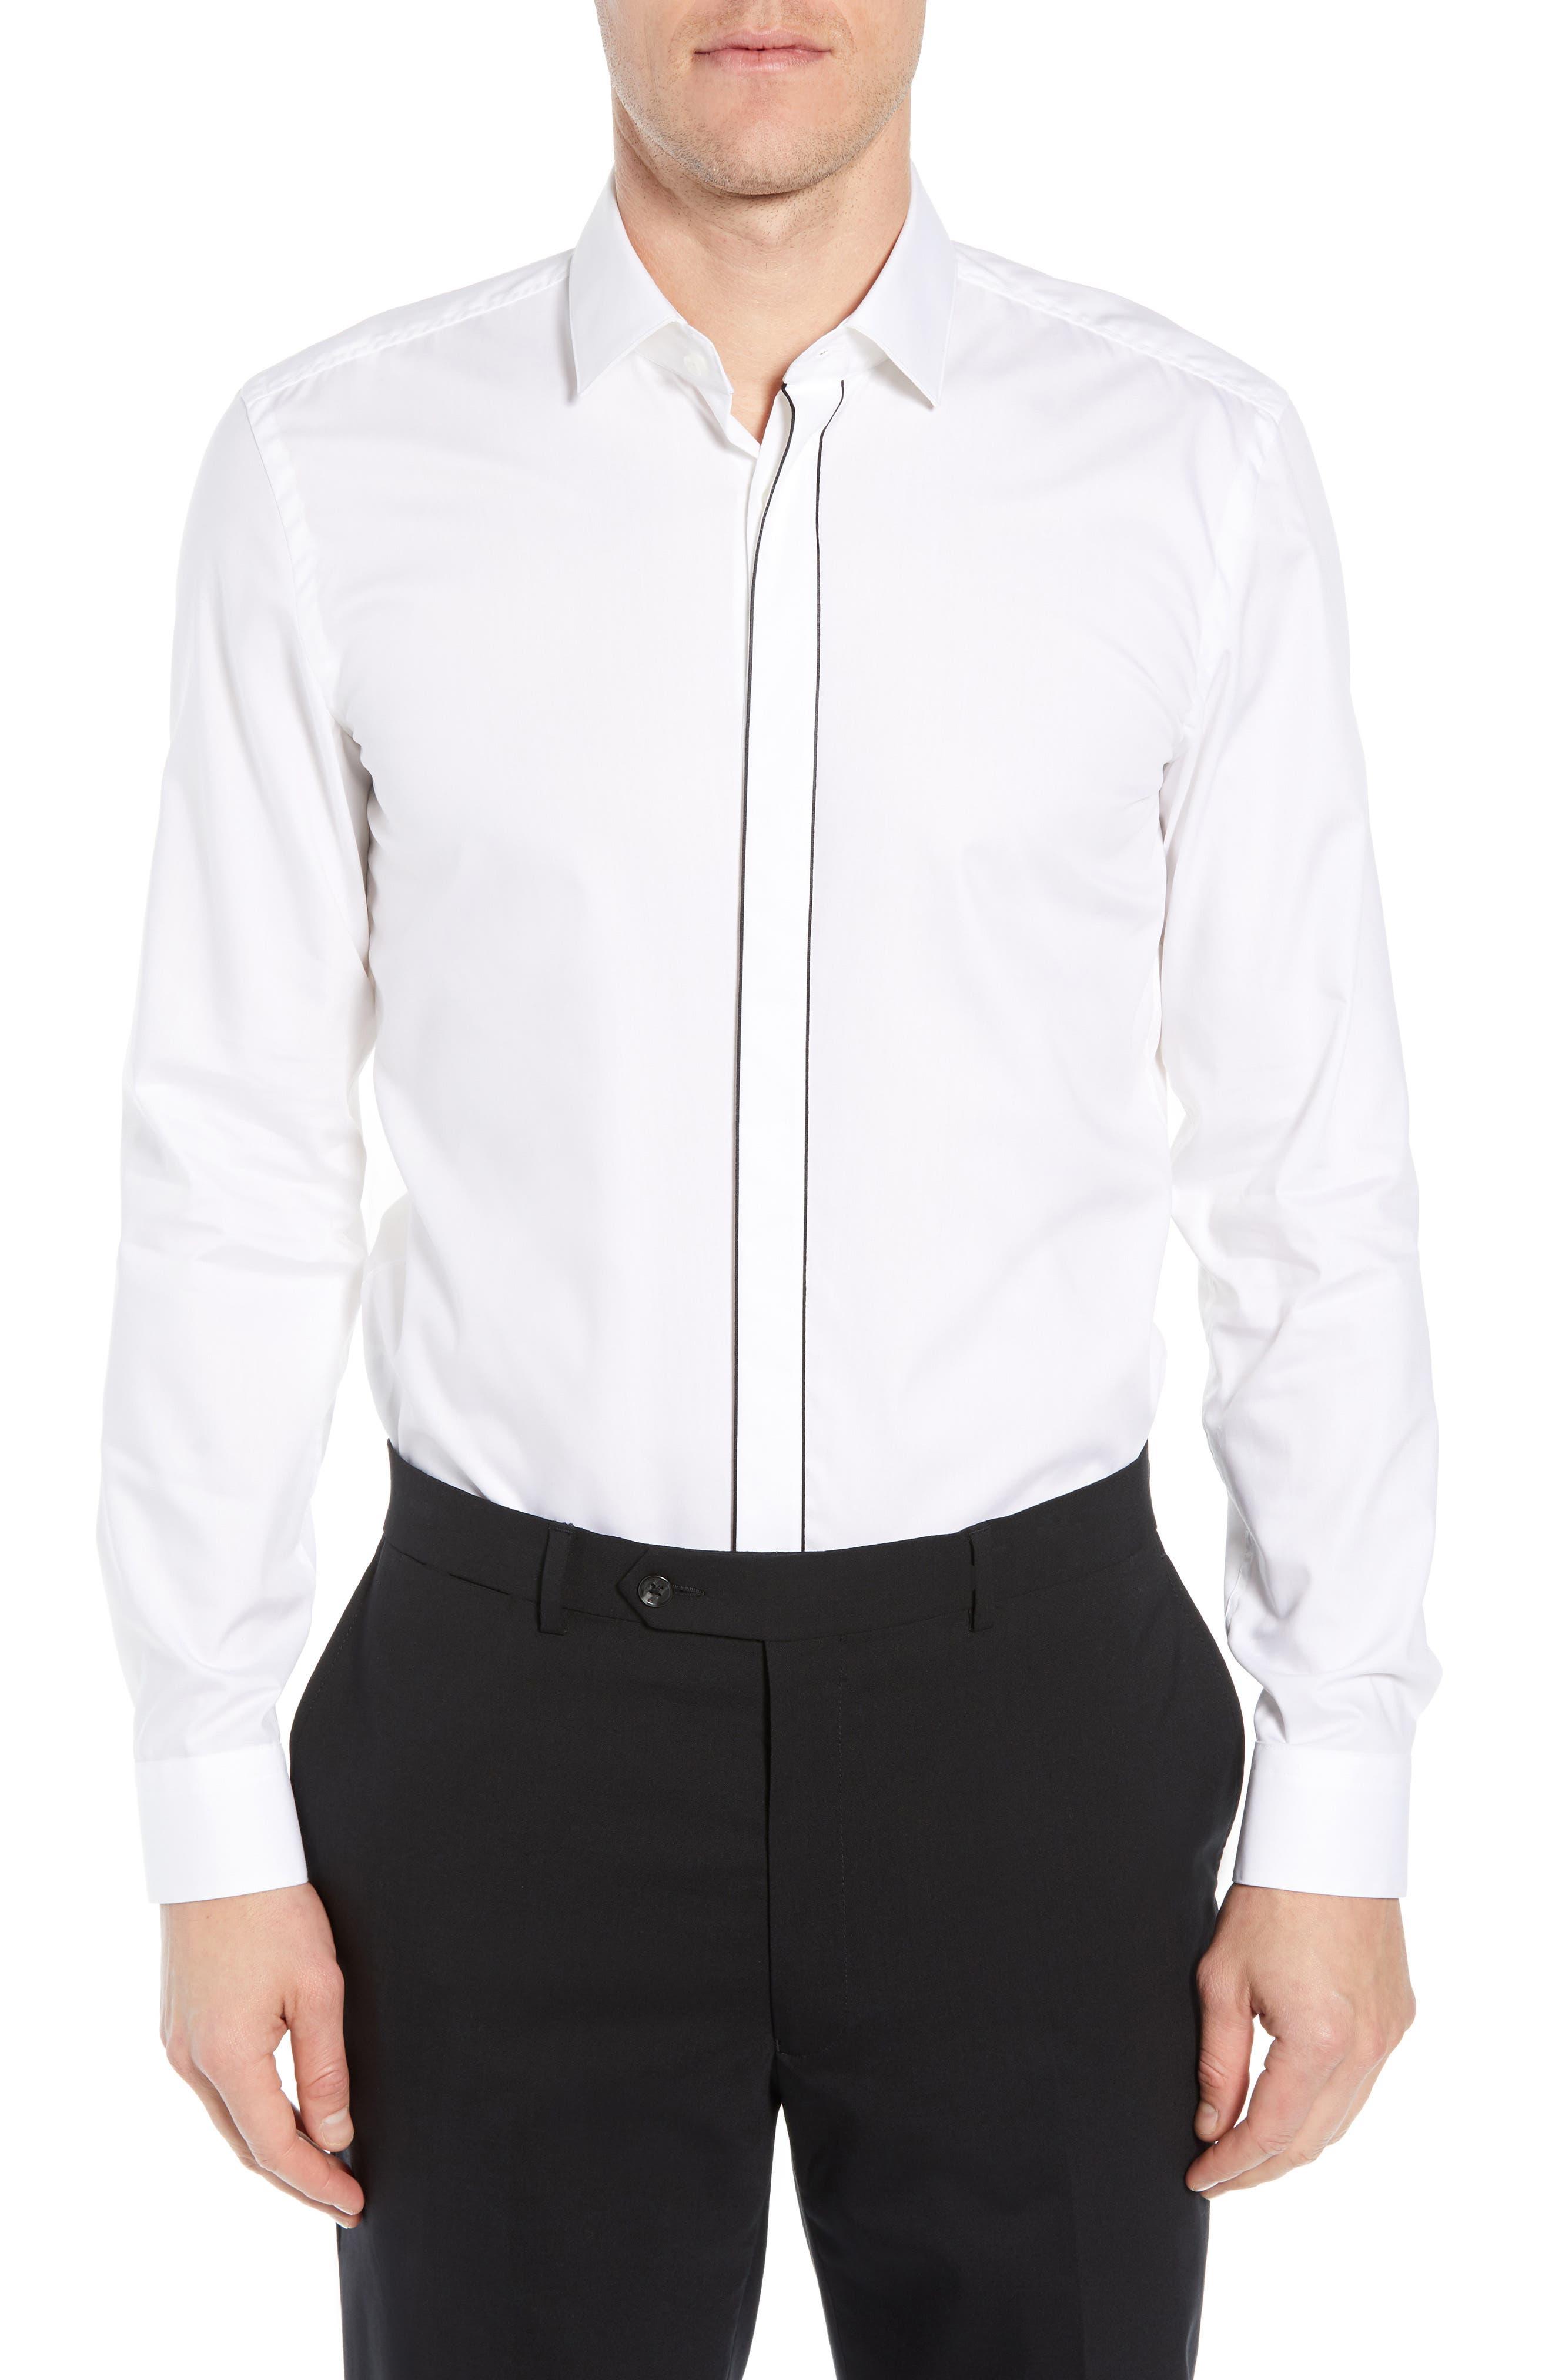 Jamir Slim Fit Easy Iron Solid Dress Shirt,                             Main thumbnail 1, color,                             100